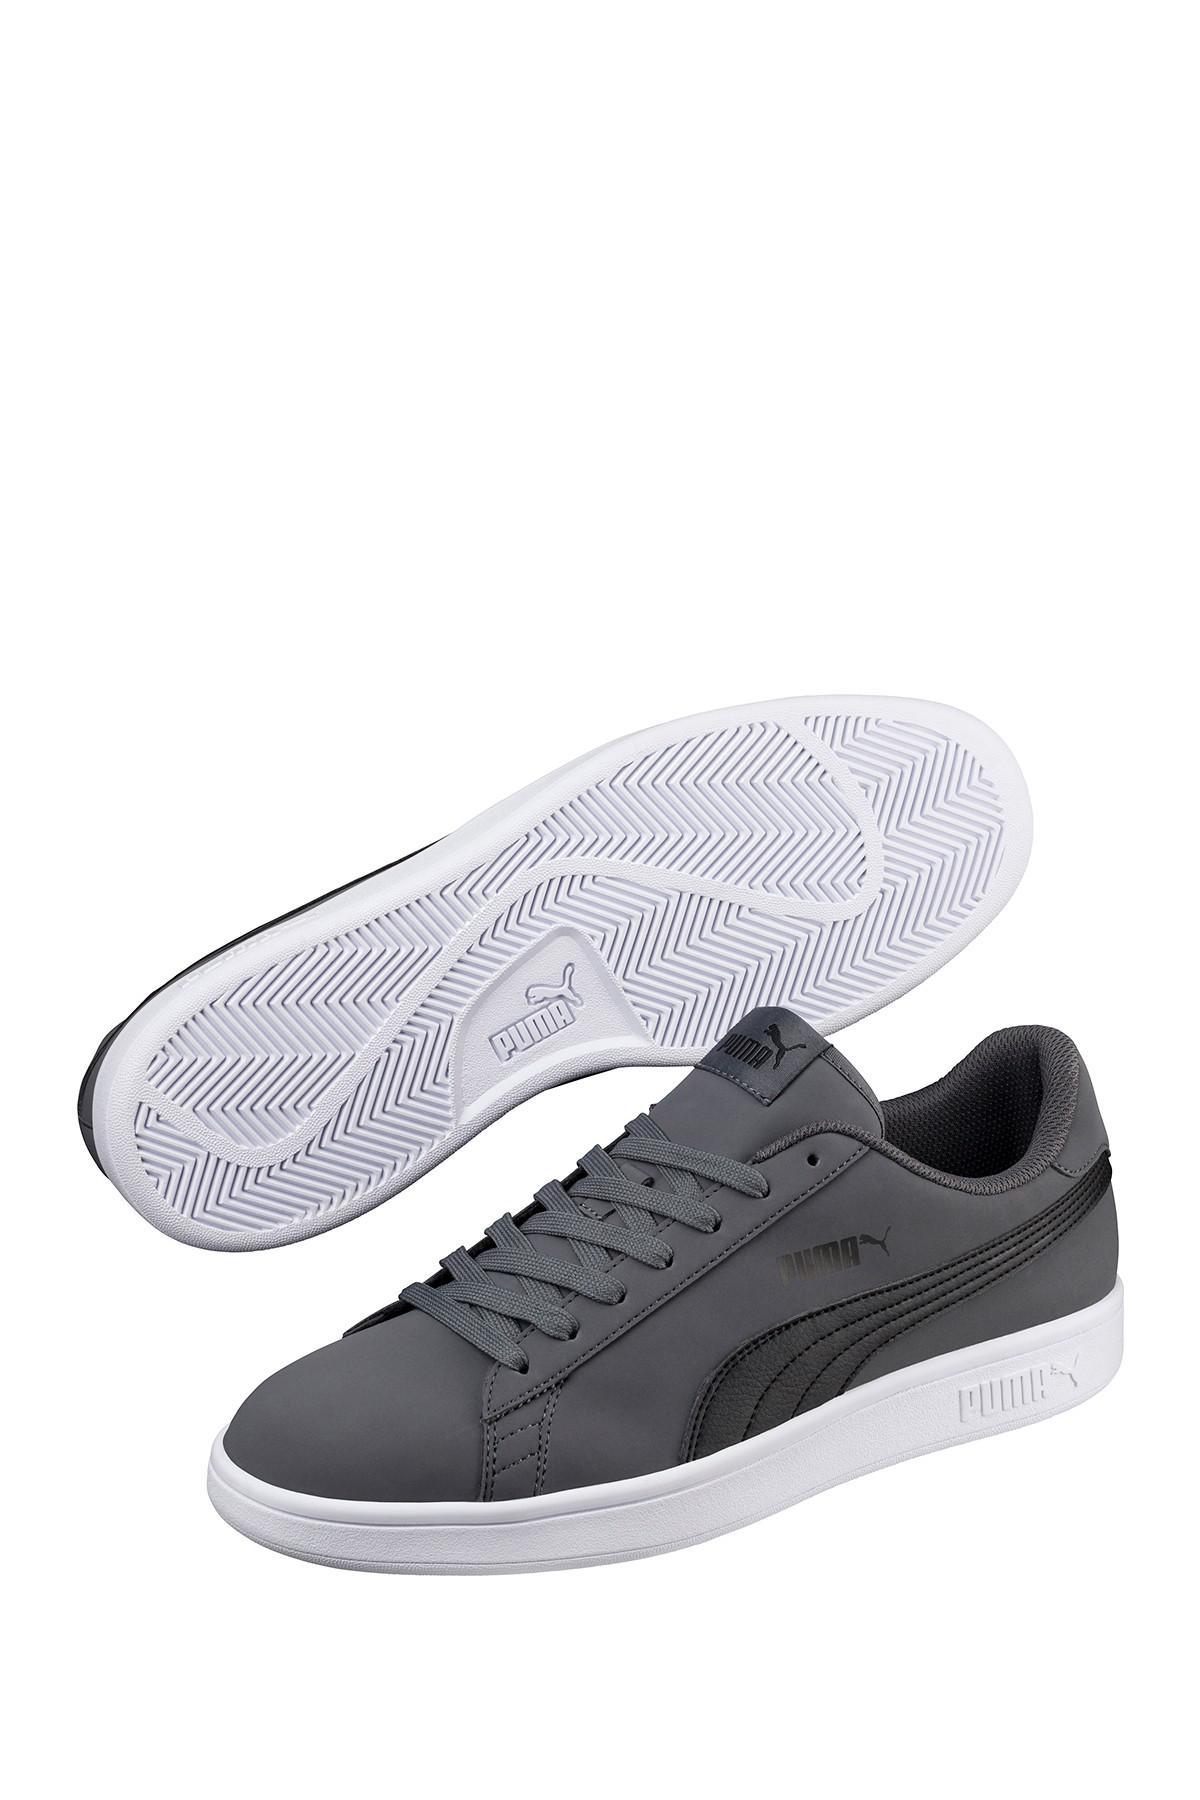 4450e4f8279 Lyst - Puma Smash V2 Buck Sneaker in Gray for Men